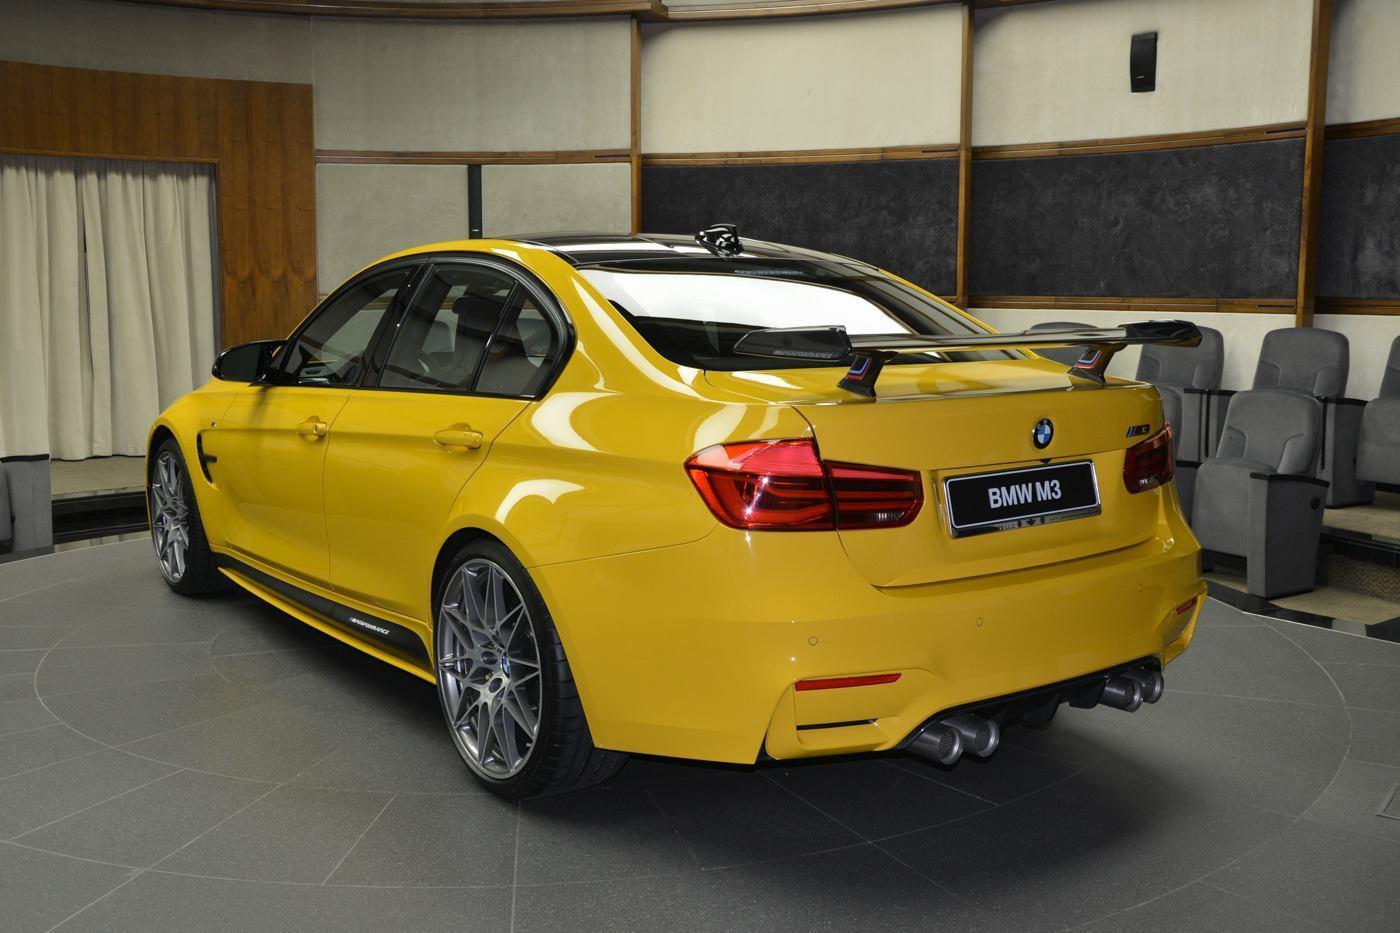 bmw-m3-speed-yellow-avec-m-performance-a-l-esprit-de-m4-gts-400-7.jpg